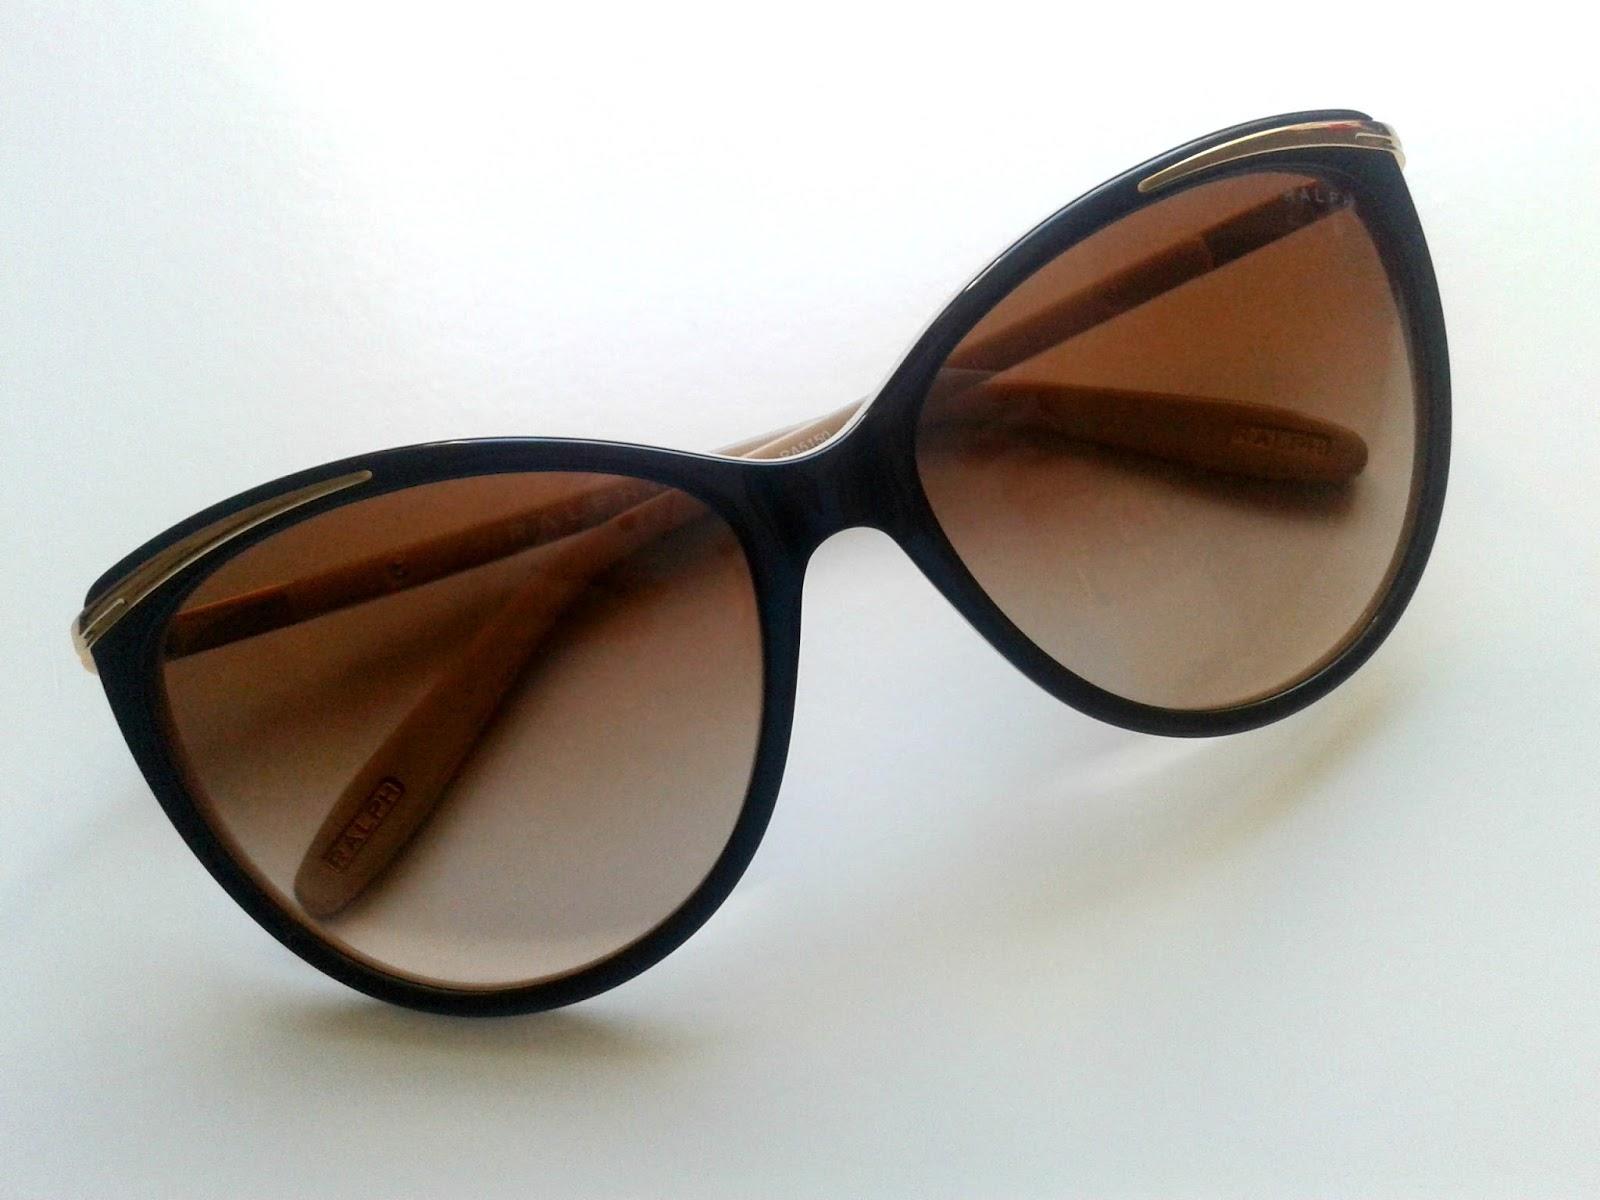 Ralph by Ralph Lauren 5150 Sunglasses Review Giveaway Sunglasses Shop